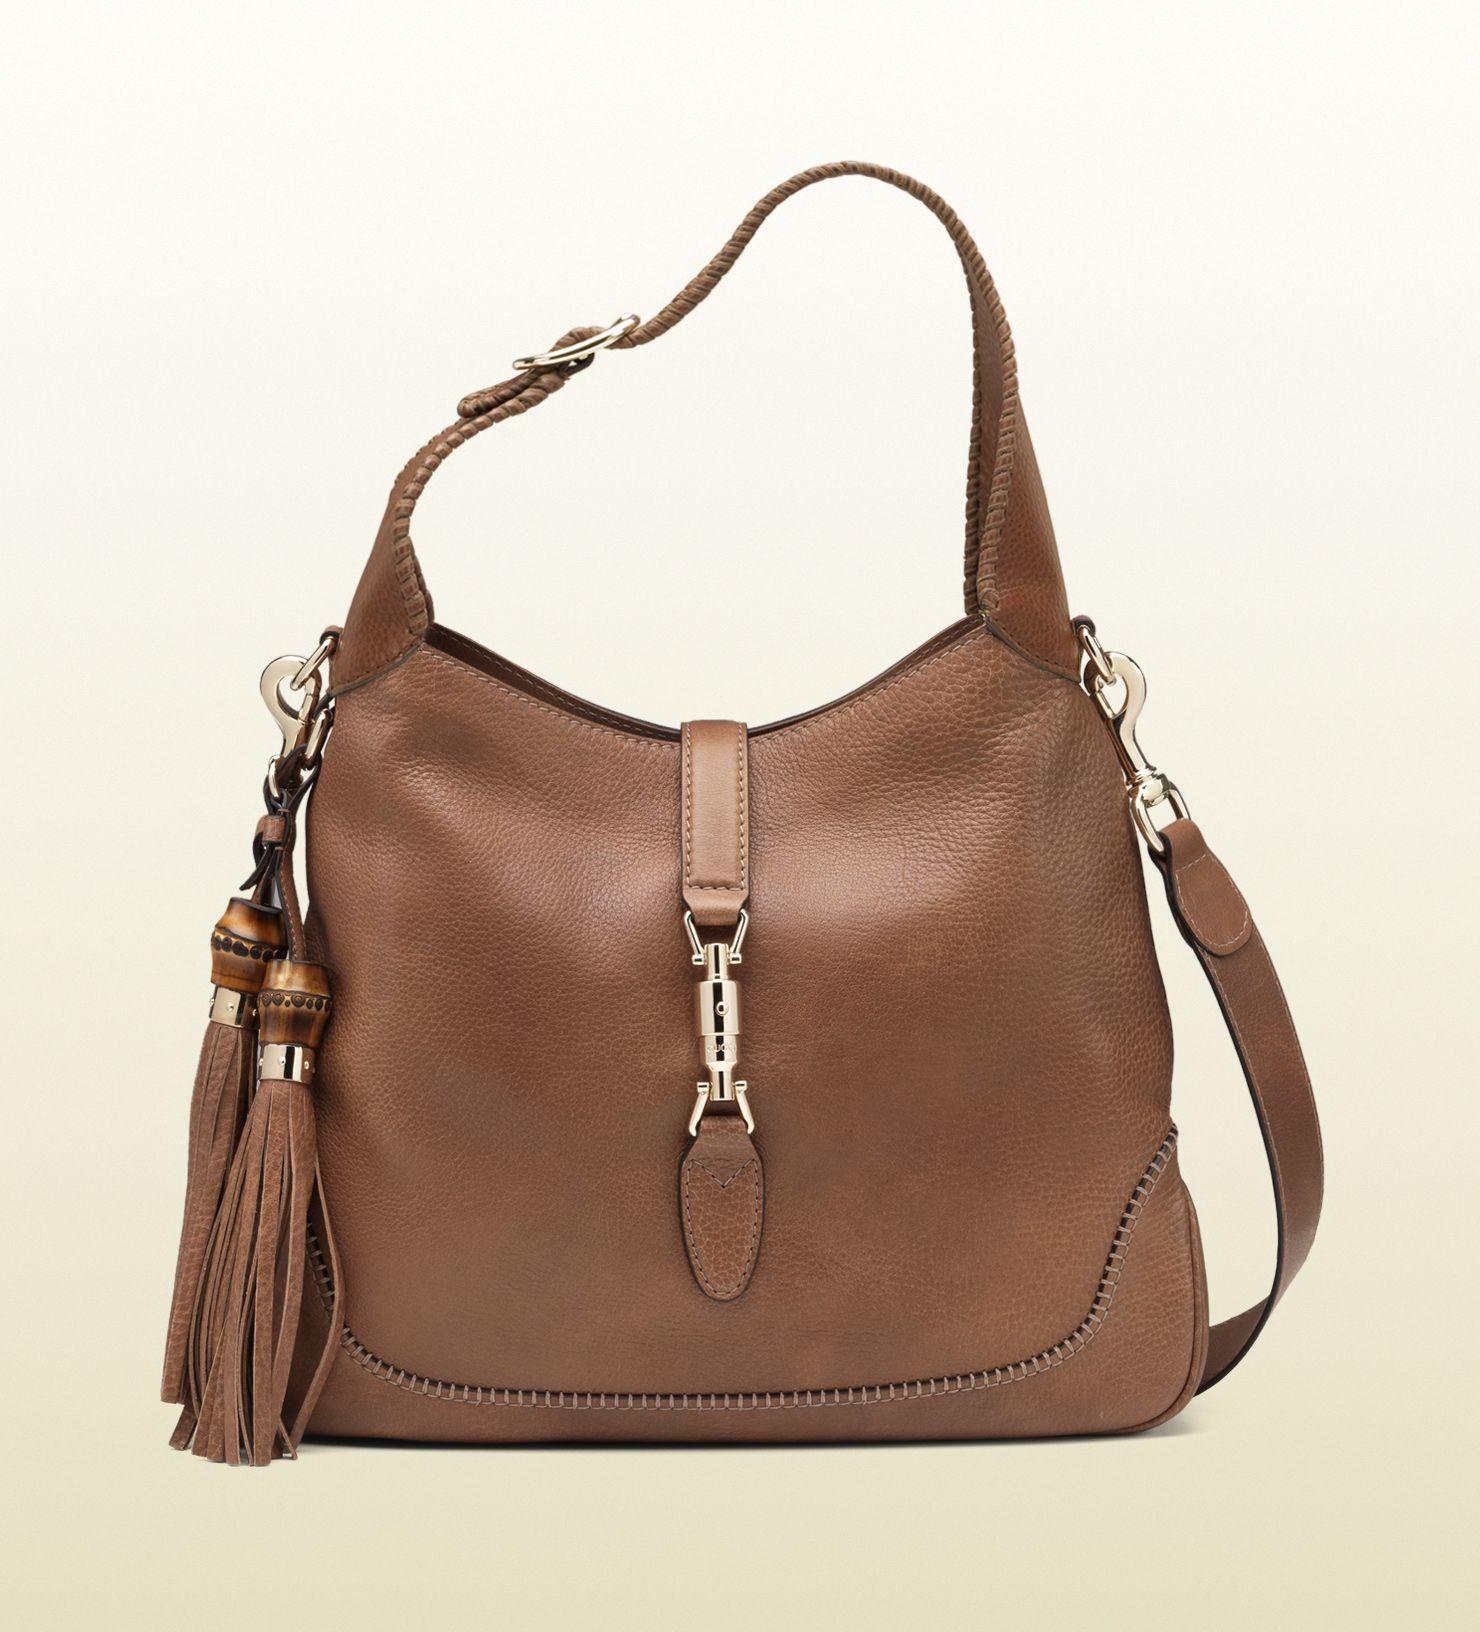 818d747191 sac à épaule new jackie en cuir marron clair | bags | Bags, Gucci ...